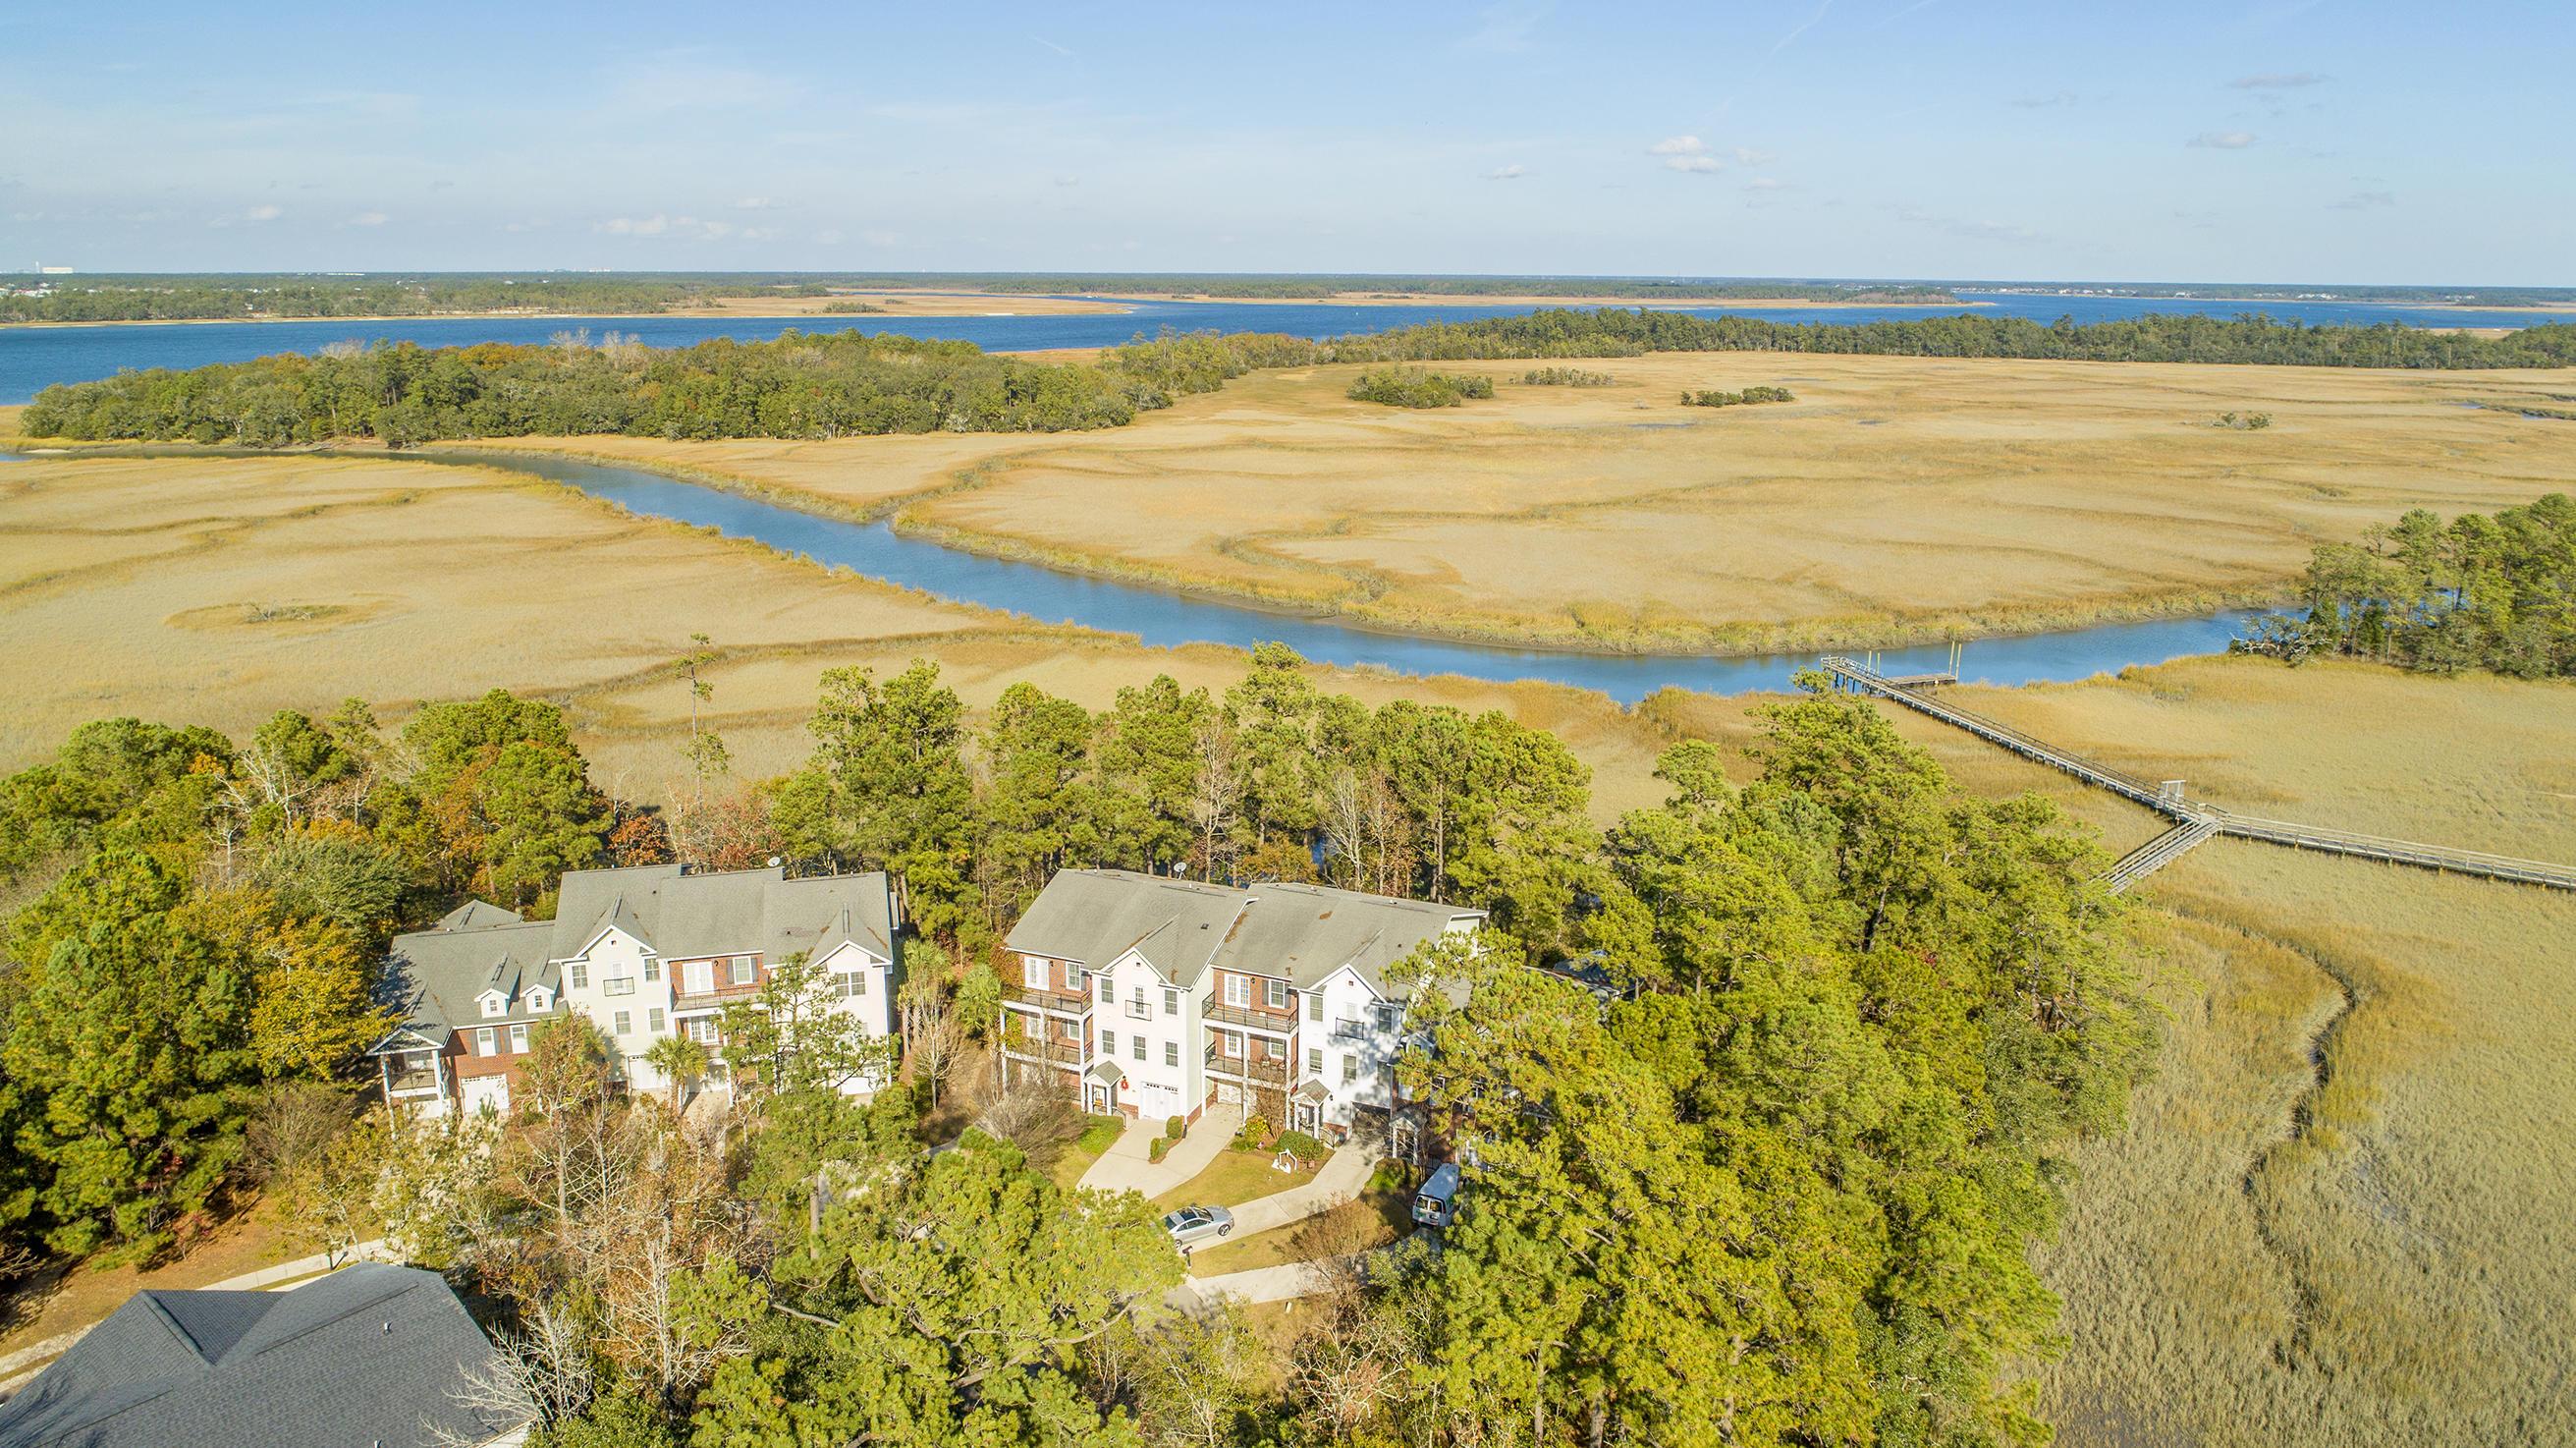 Etiwan Pointe Homes For Sale - 124 Winding Creek, Mount Pleasant, SC - 9